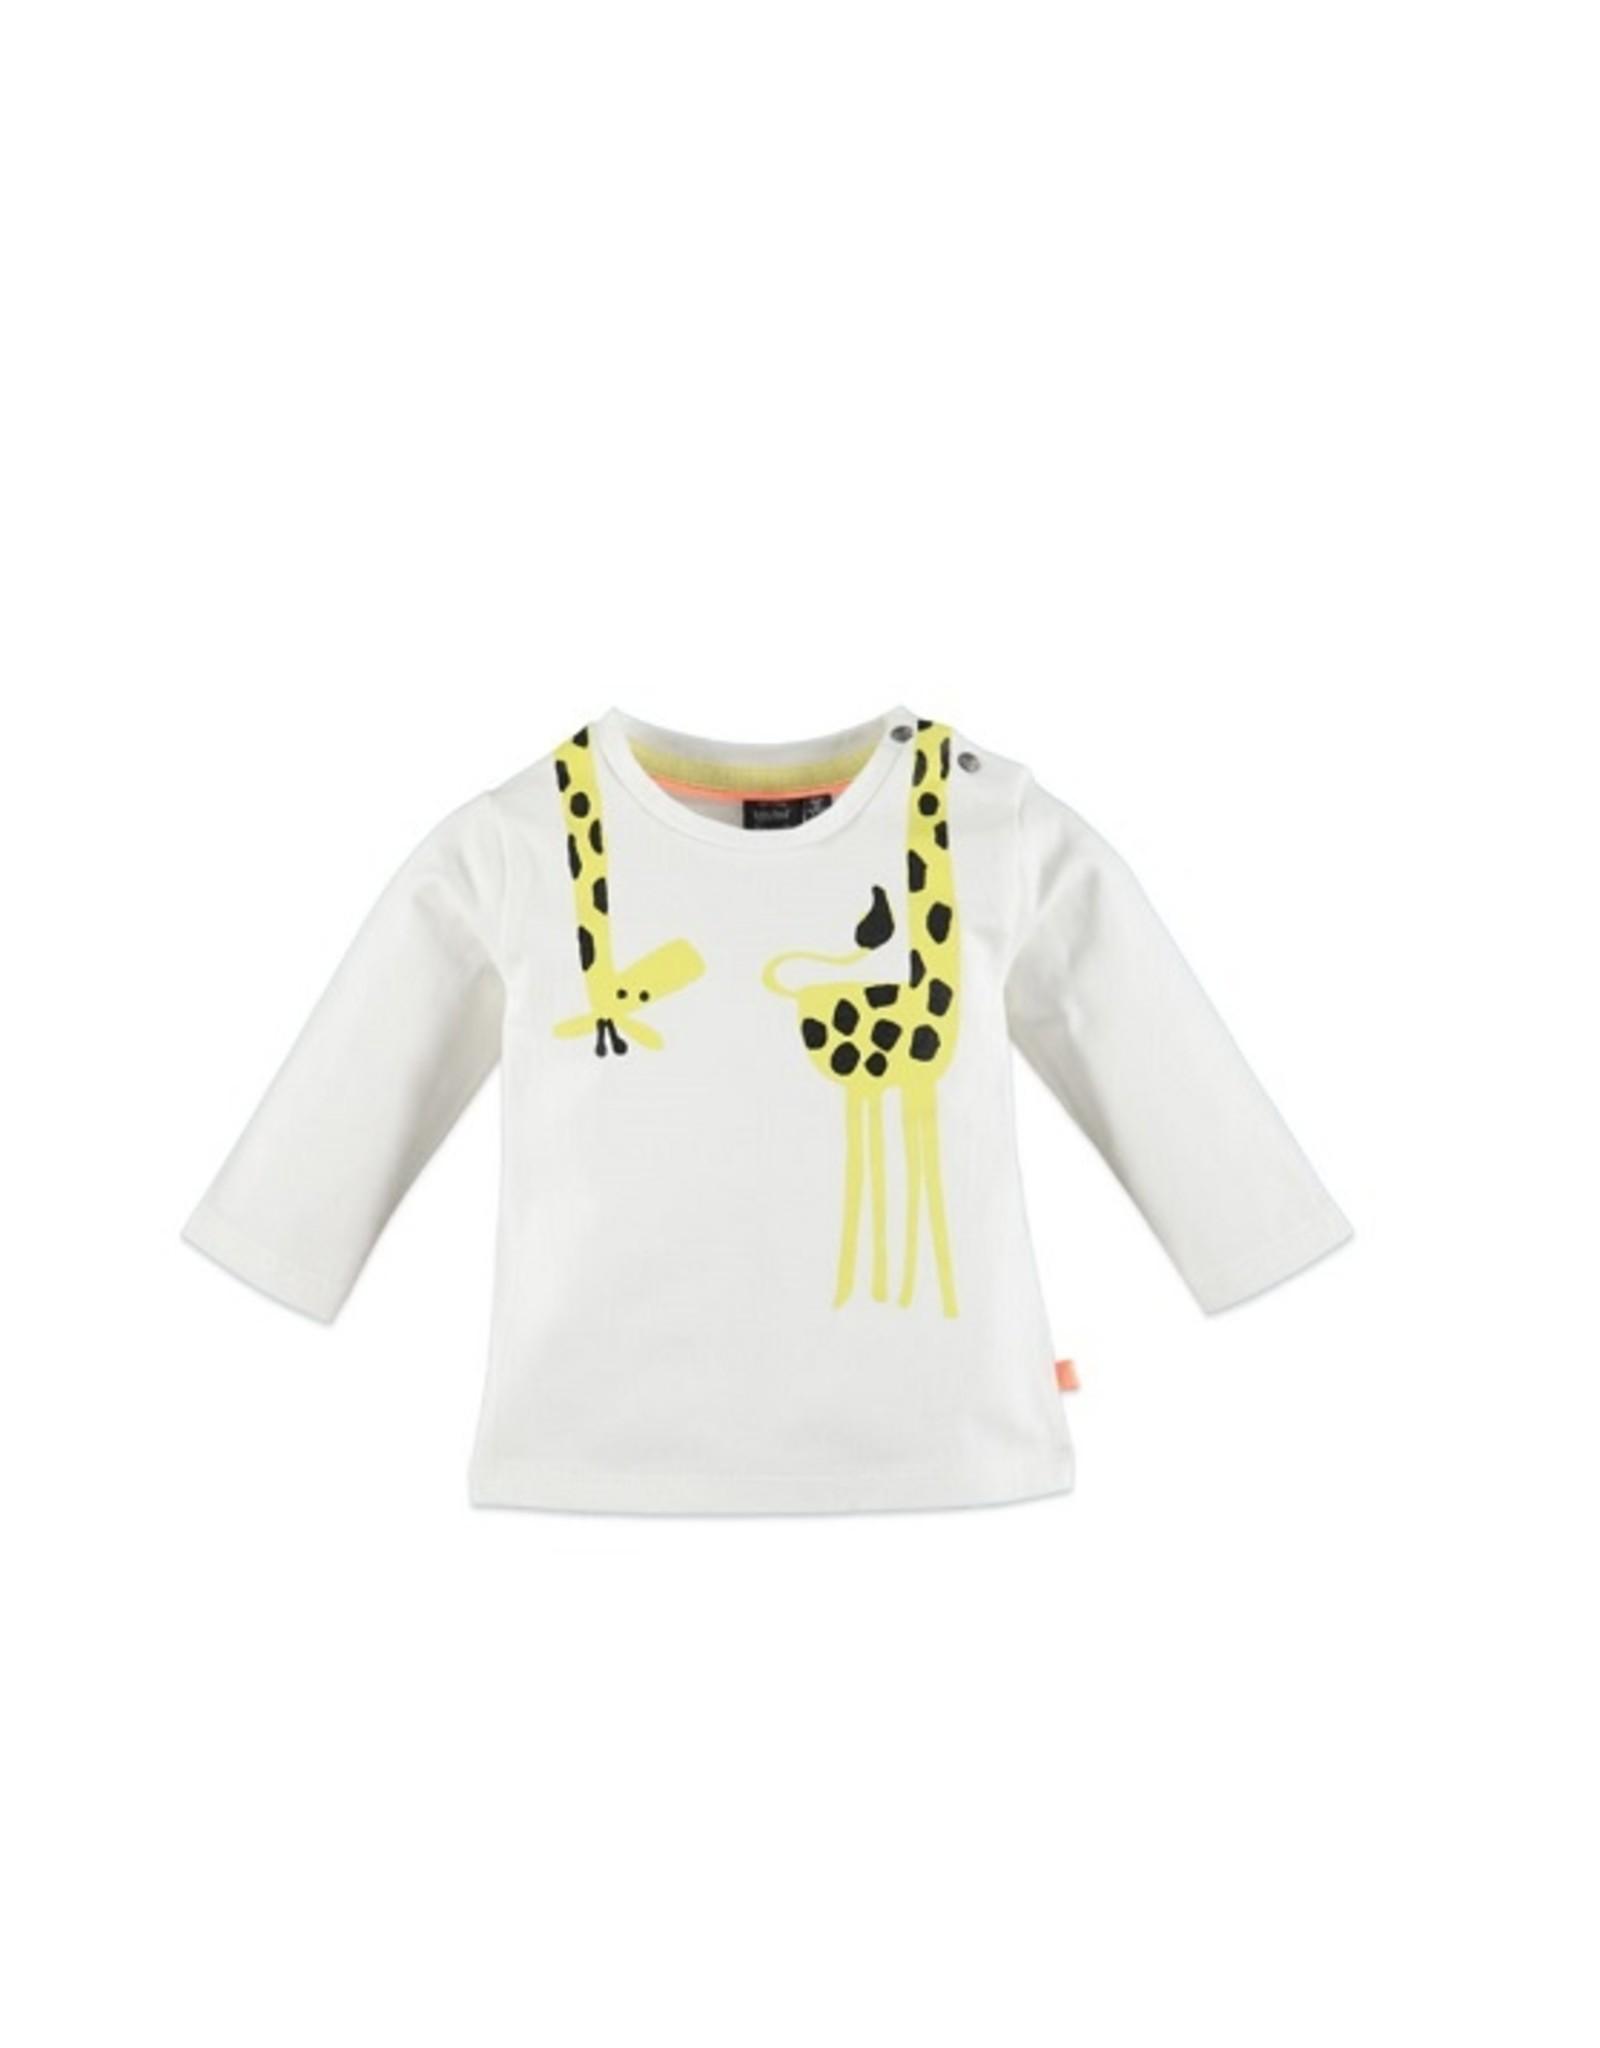 Babyface Jongens T-shirt ecru giraf - maat 56